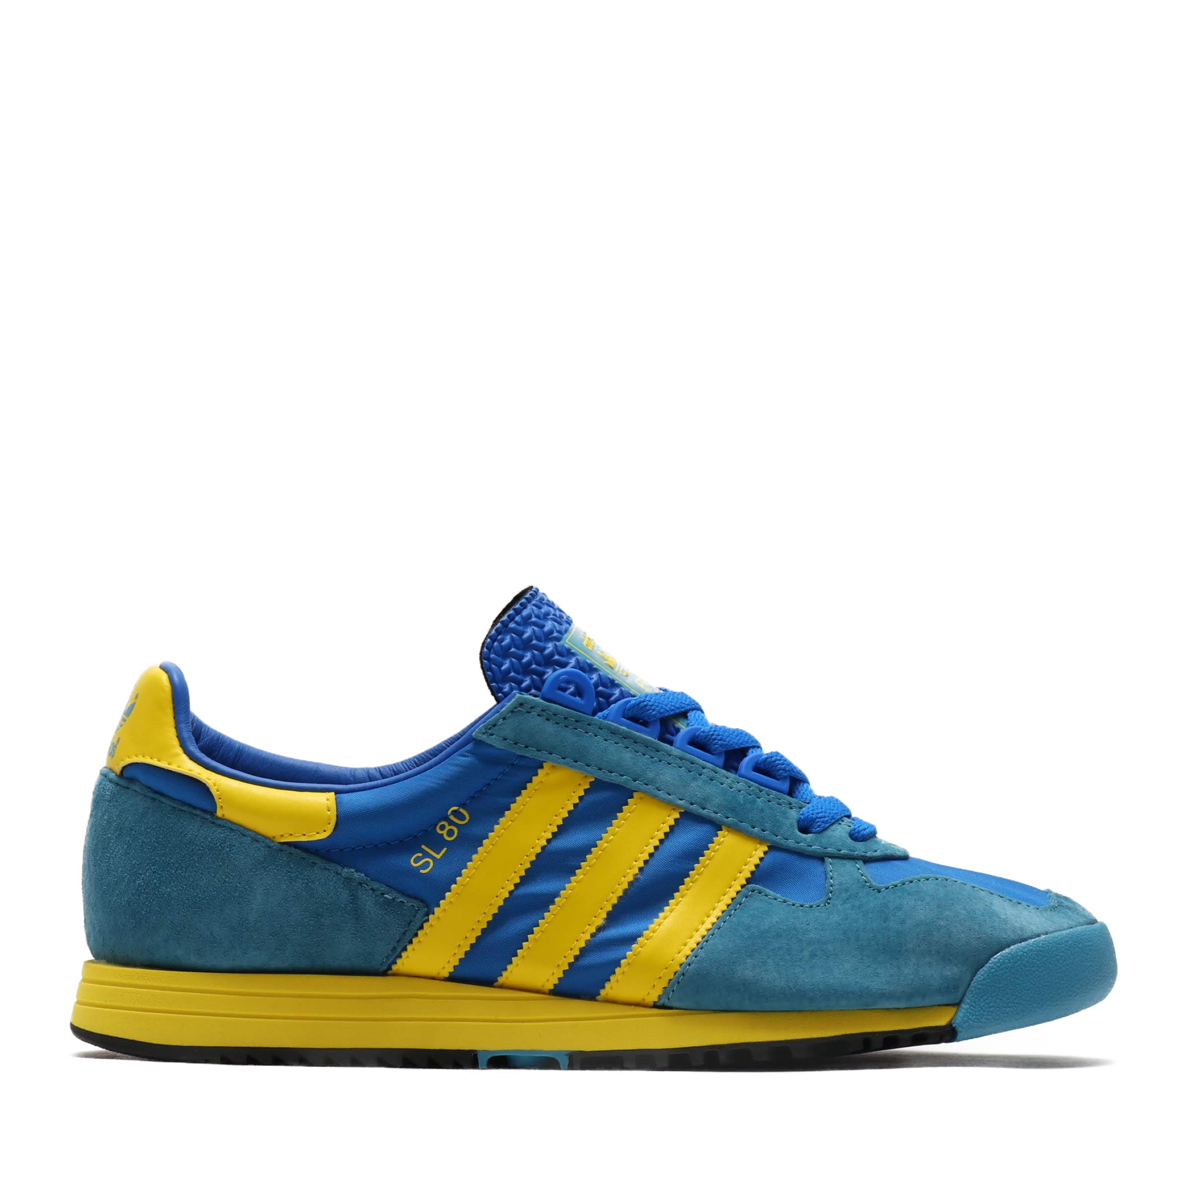 adidas SL 80(GLORY BLUE/YELLOW/TACTILE STEEL)(アディダス エスエル 80)【メンズ】【レディース】【スニーカー】【20SS-I】